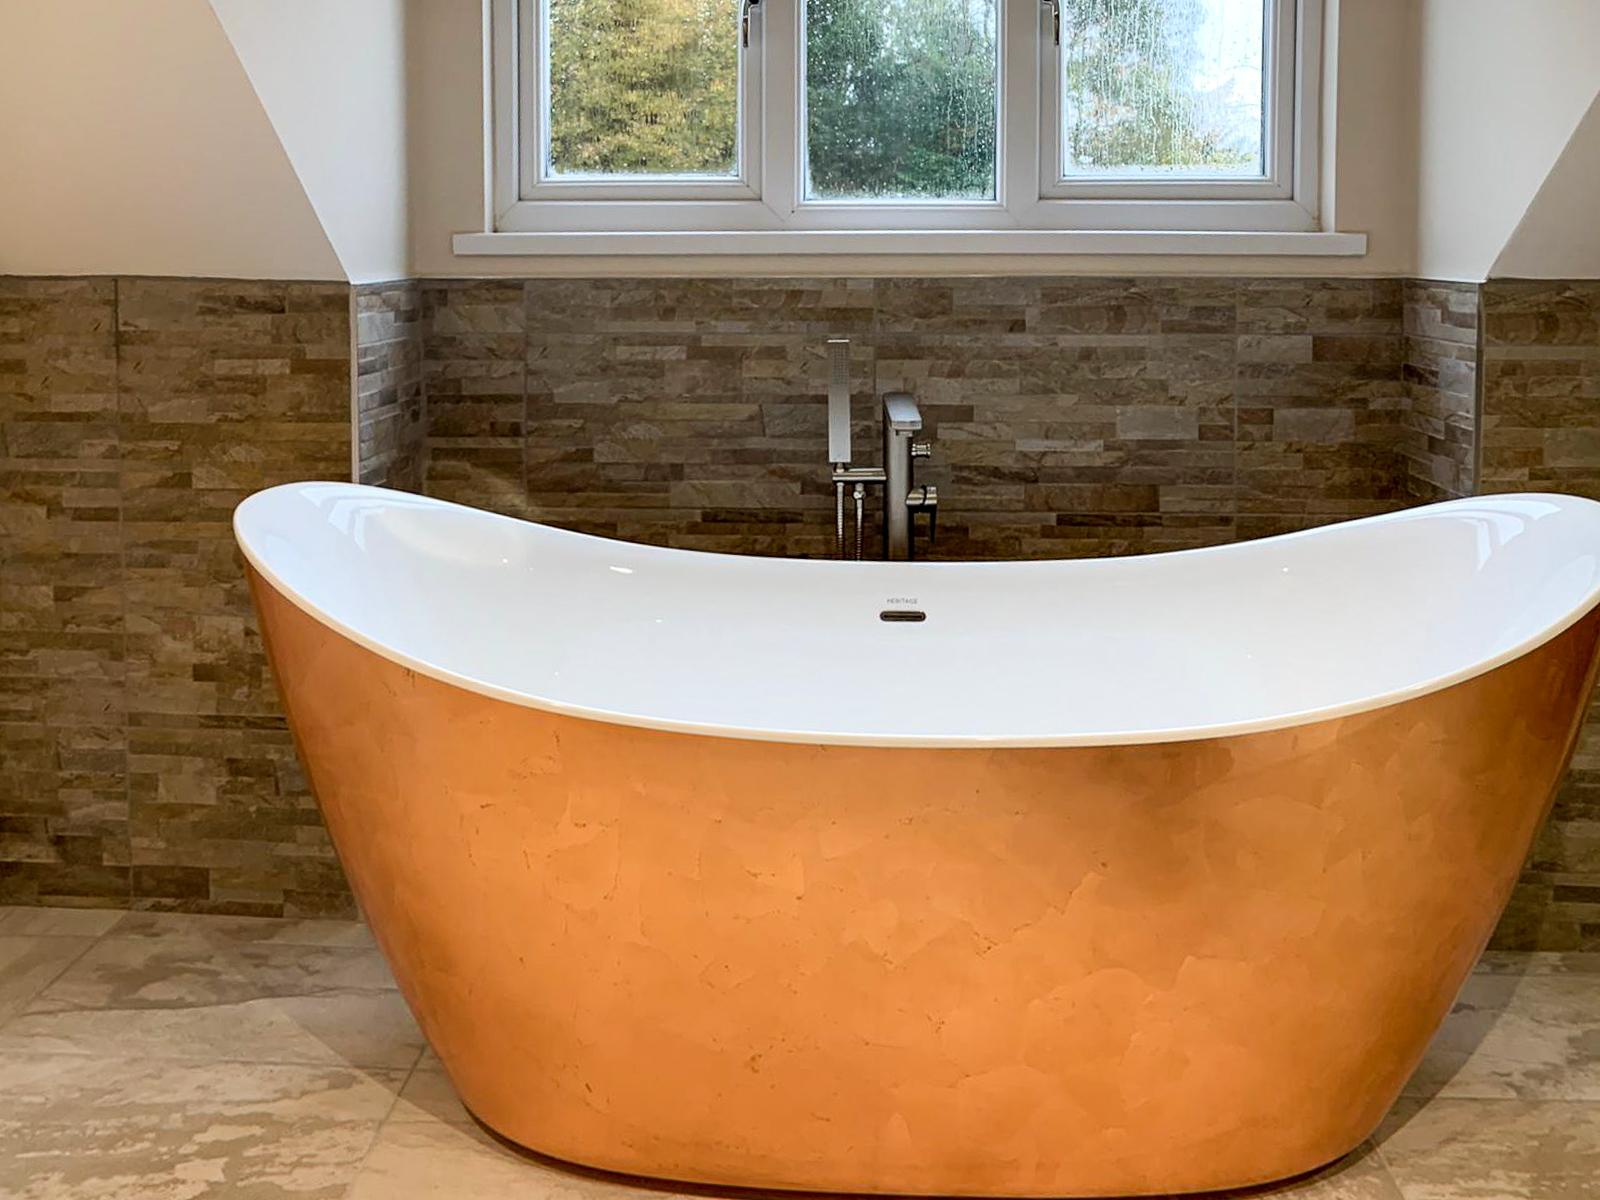 bronze bathtub inside new bathroom